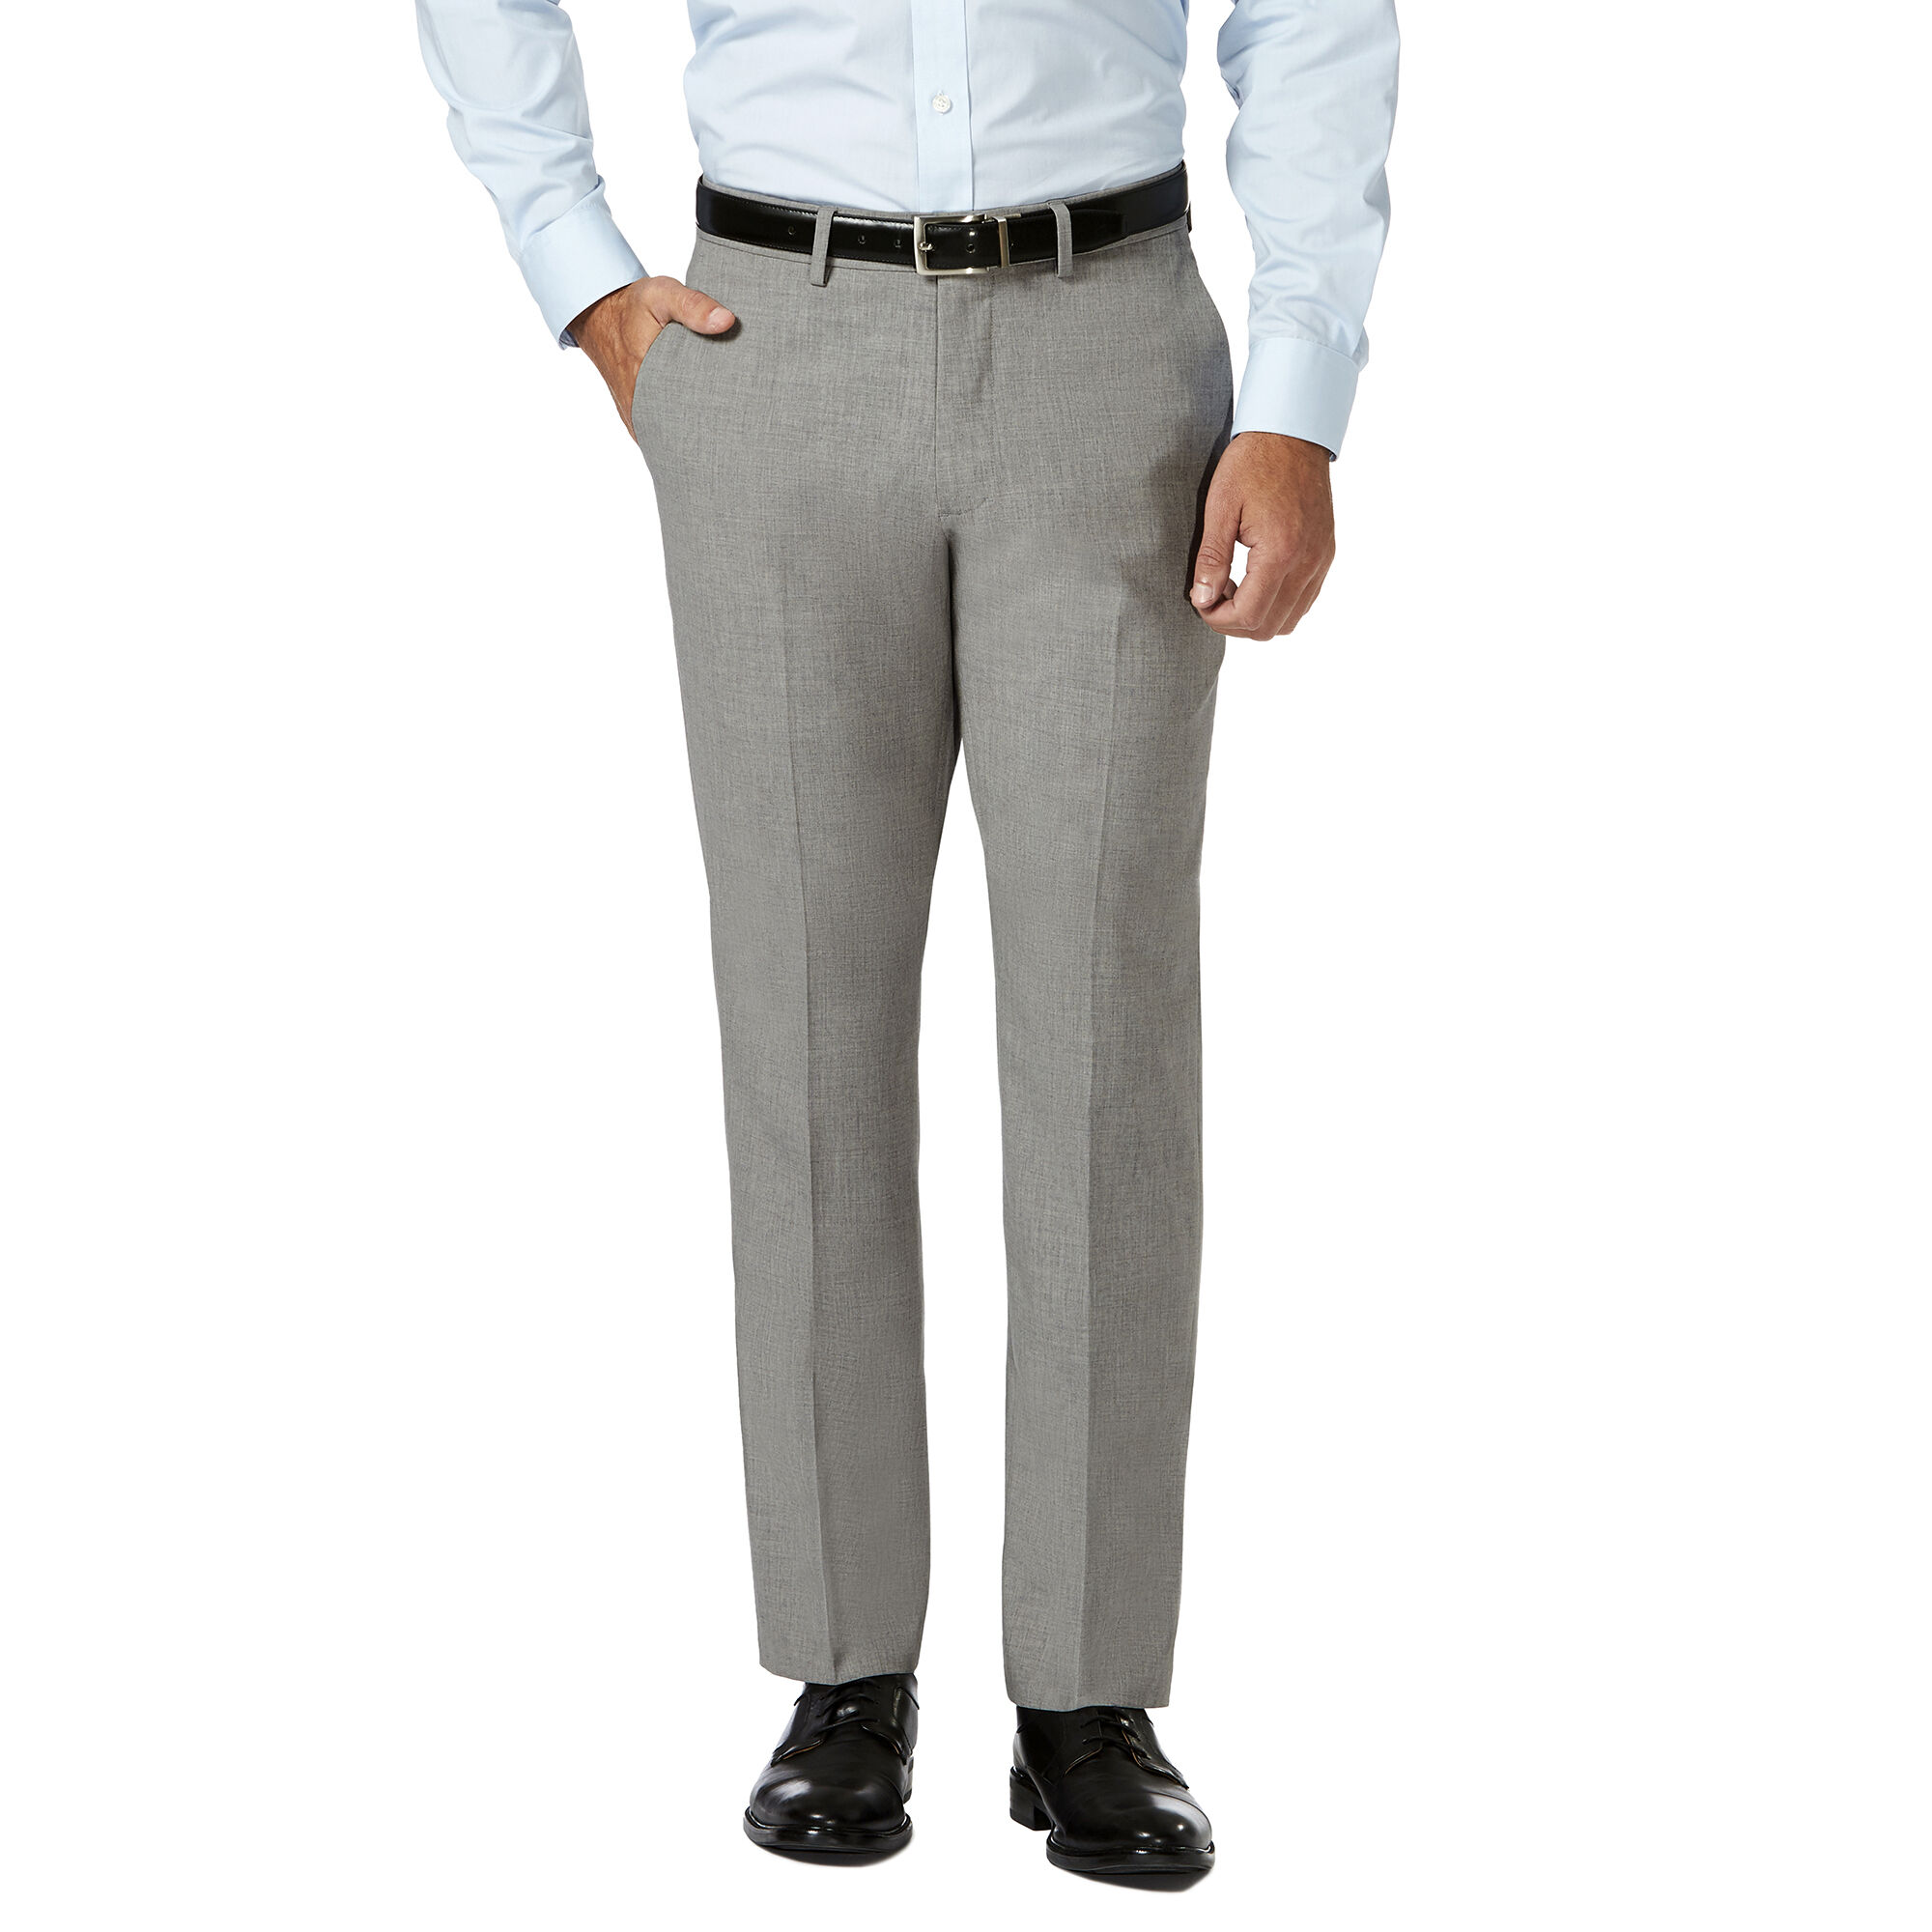 1ed7581e60817 J.M. Haggar 4 Way Stretch Dress Pant, Light Grey